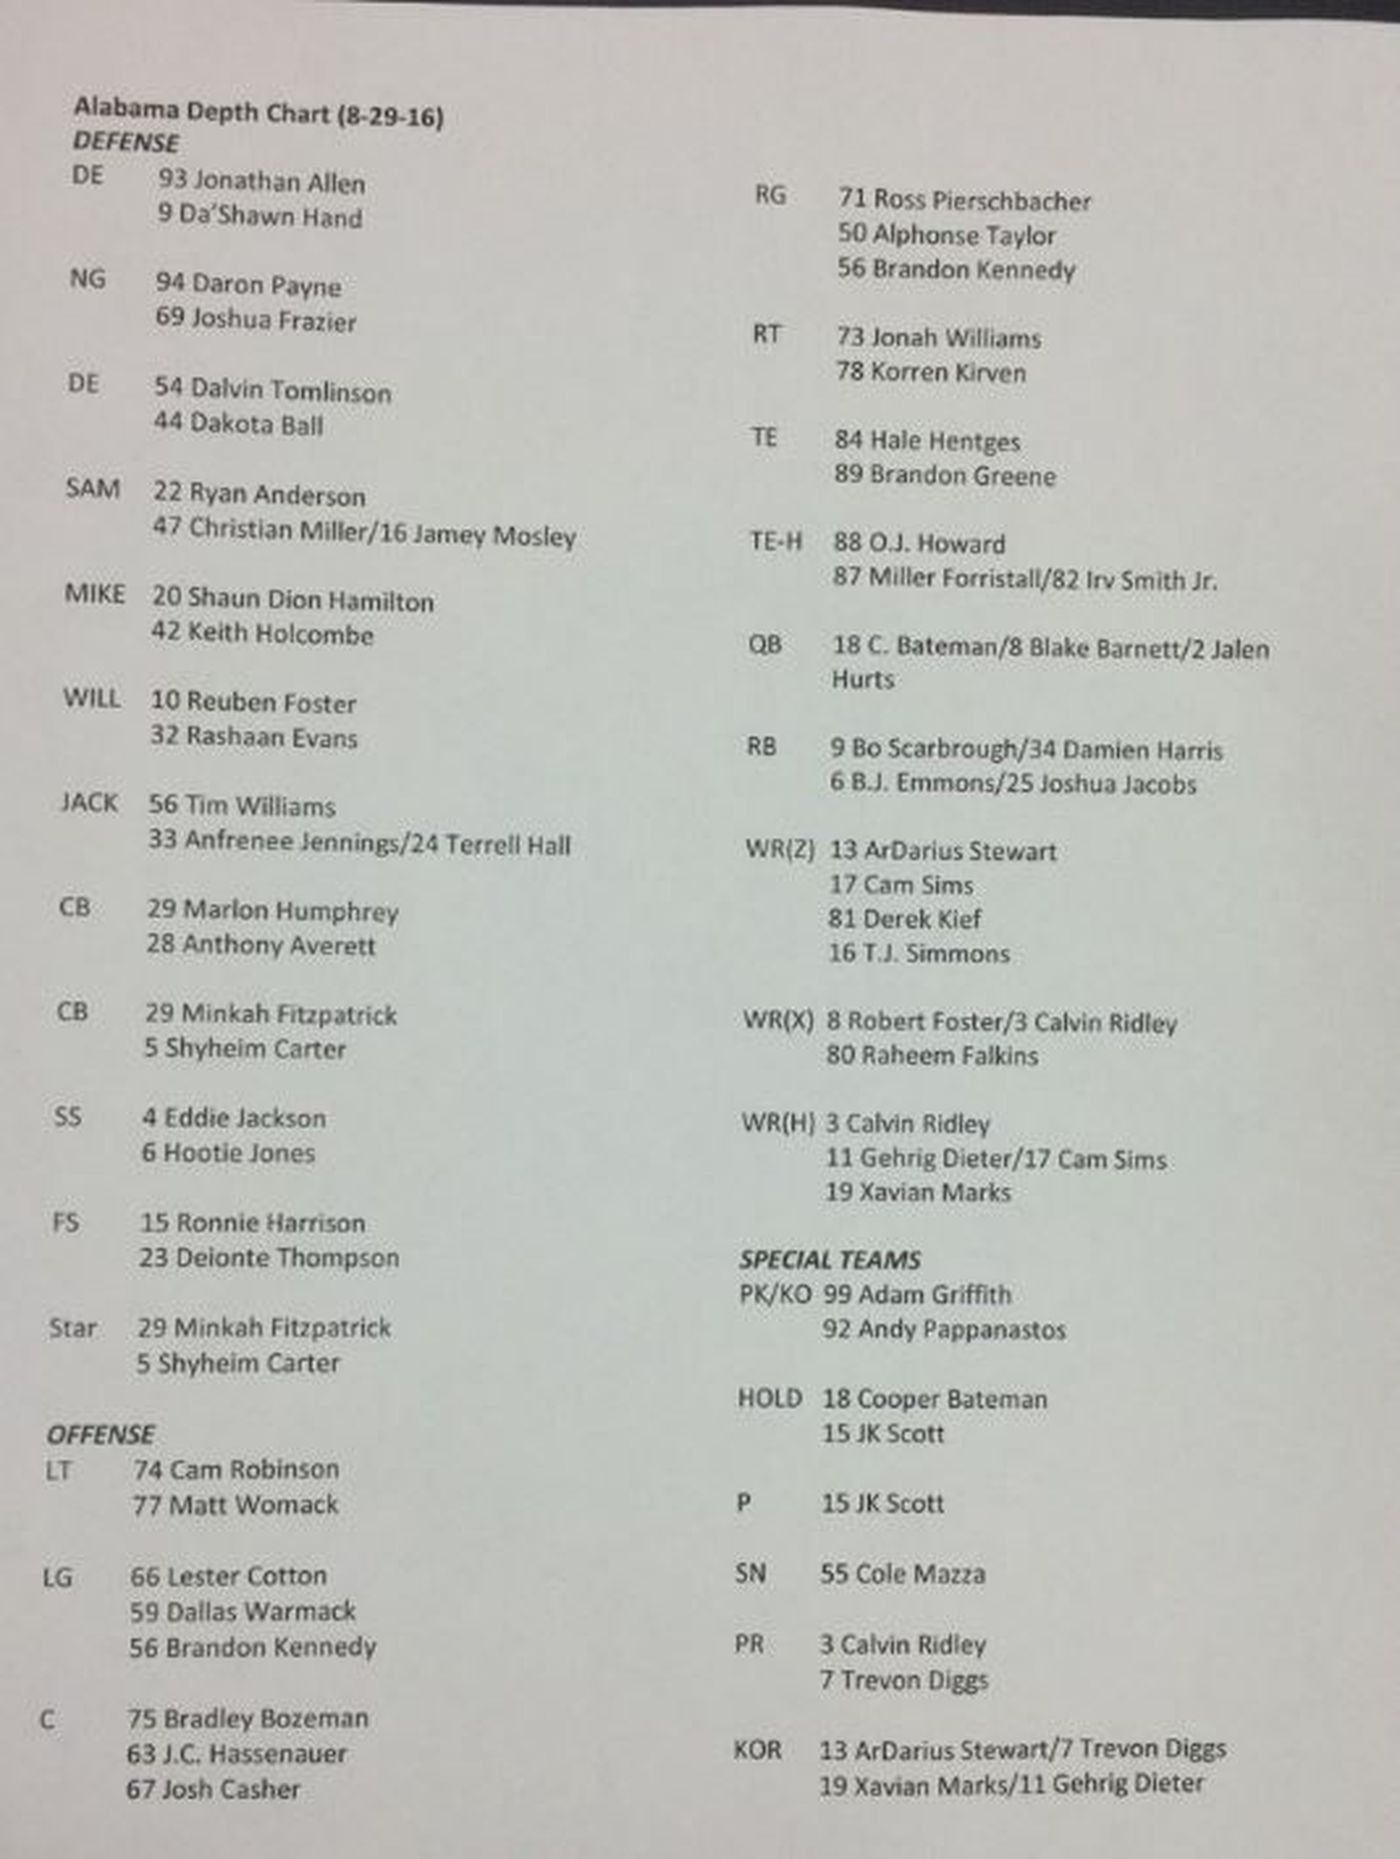 The Alabama Depth Chart Source Sheldon Haygood Wbrc